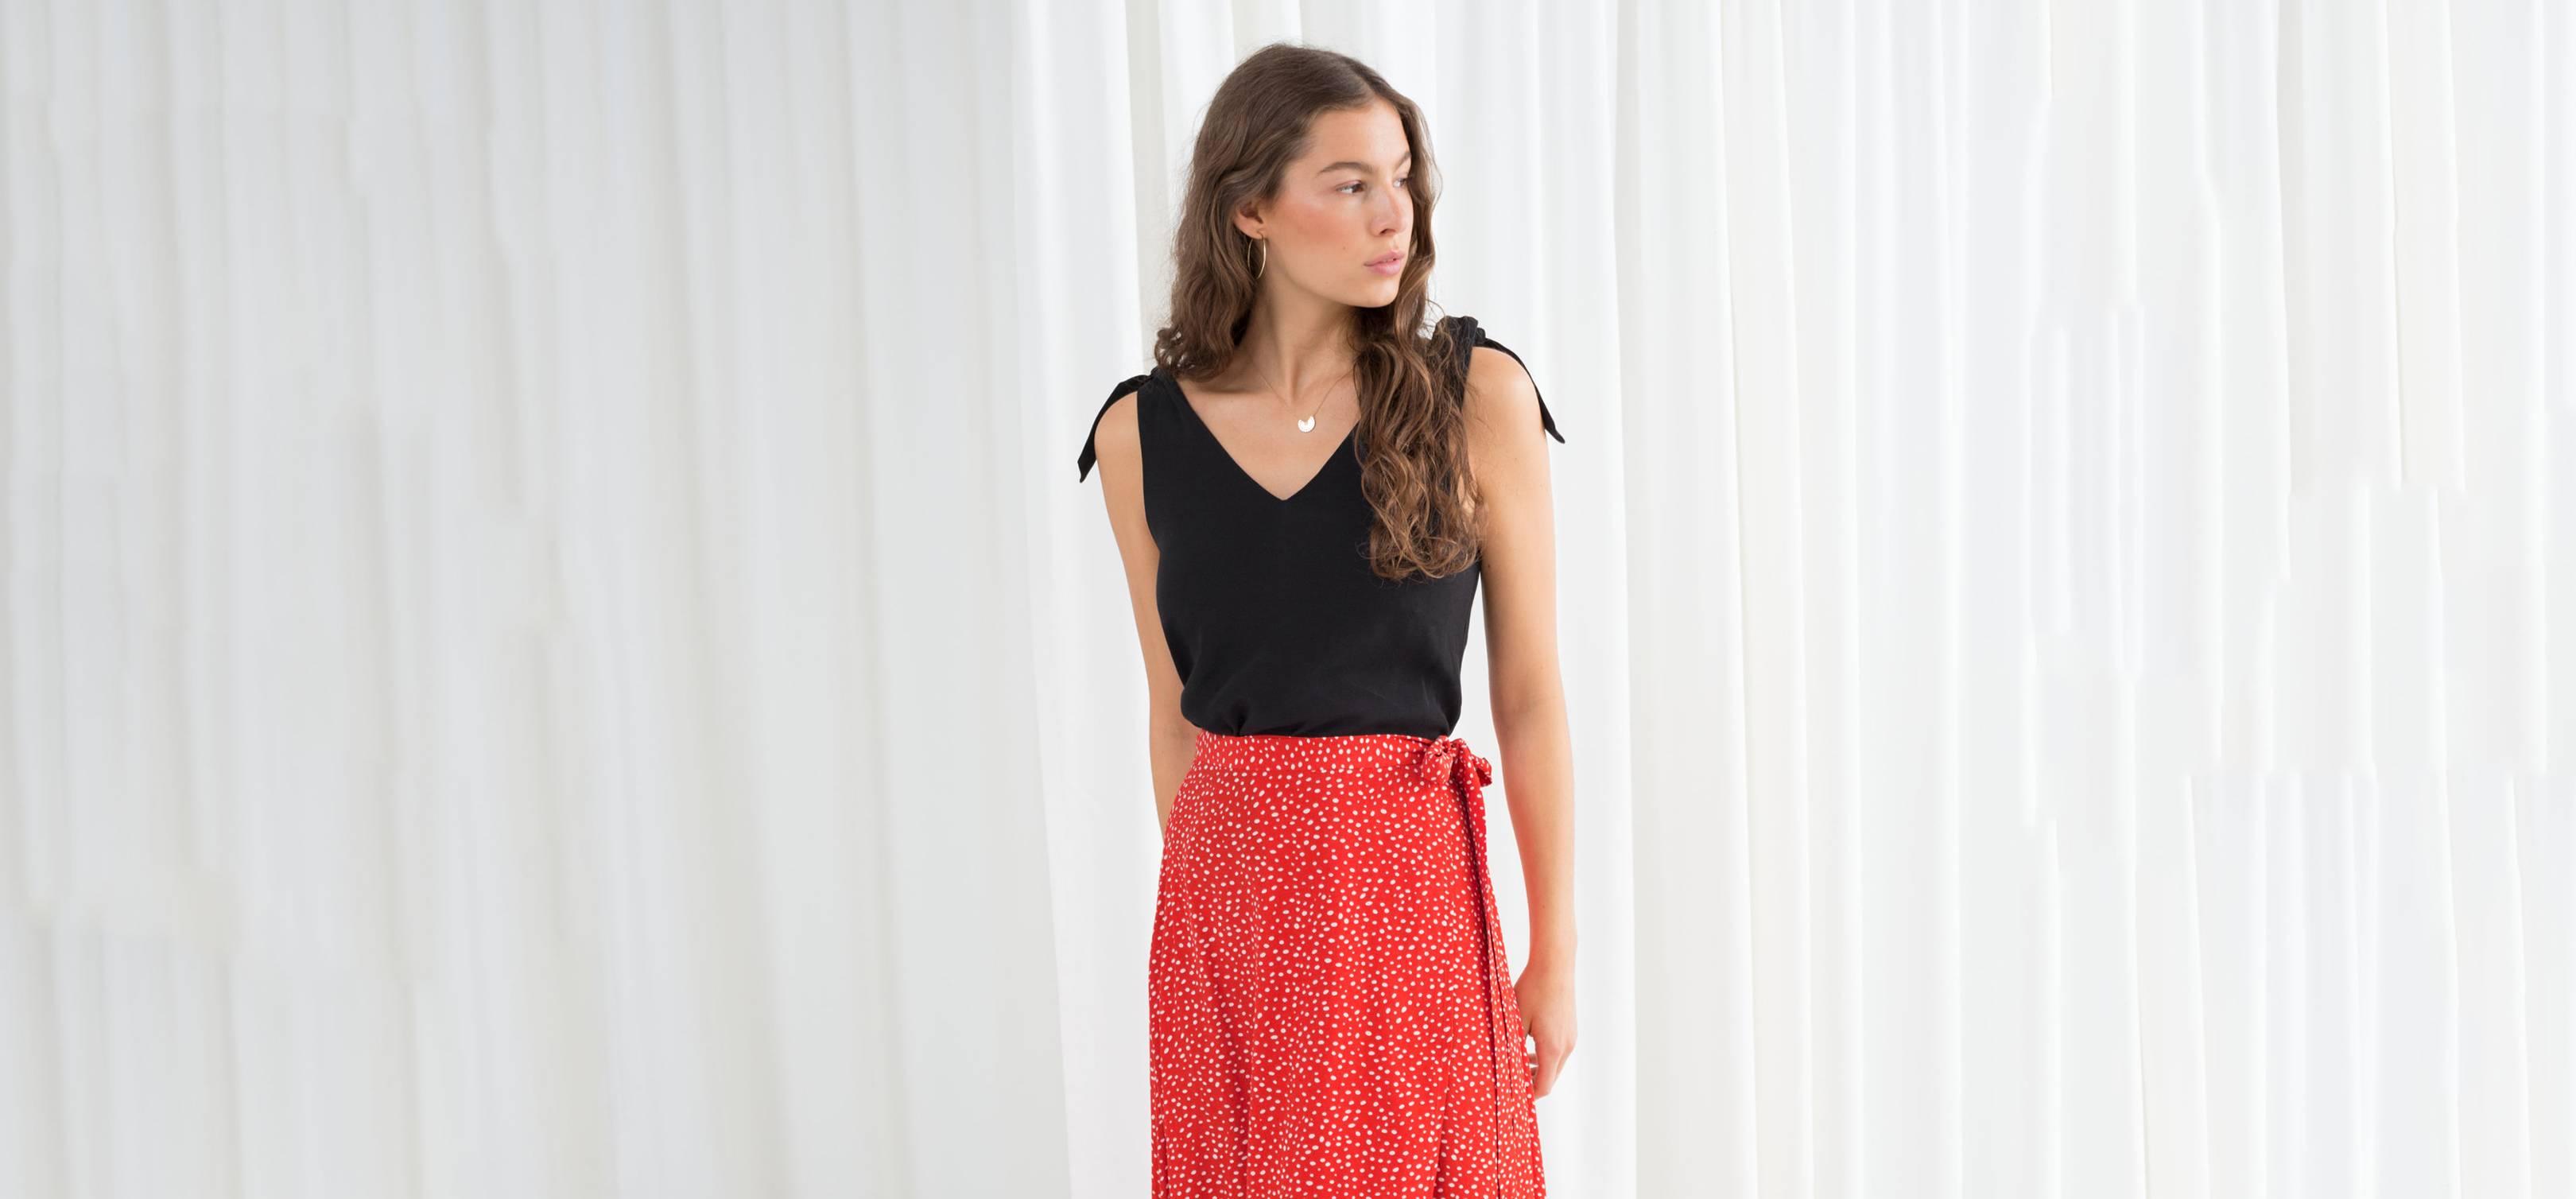 adb9c9187e Floral Maxi Skirt Shopstyle – DACC